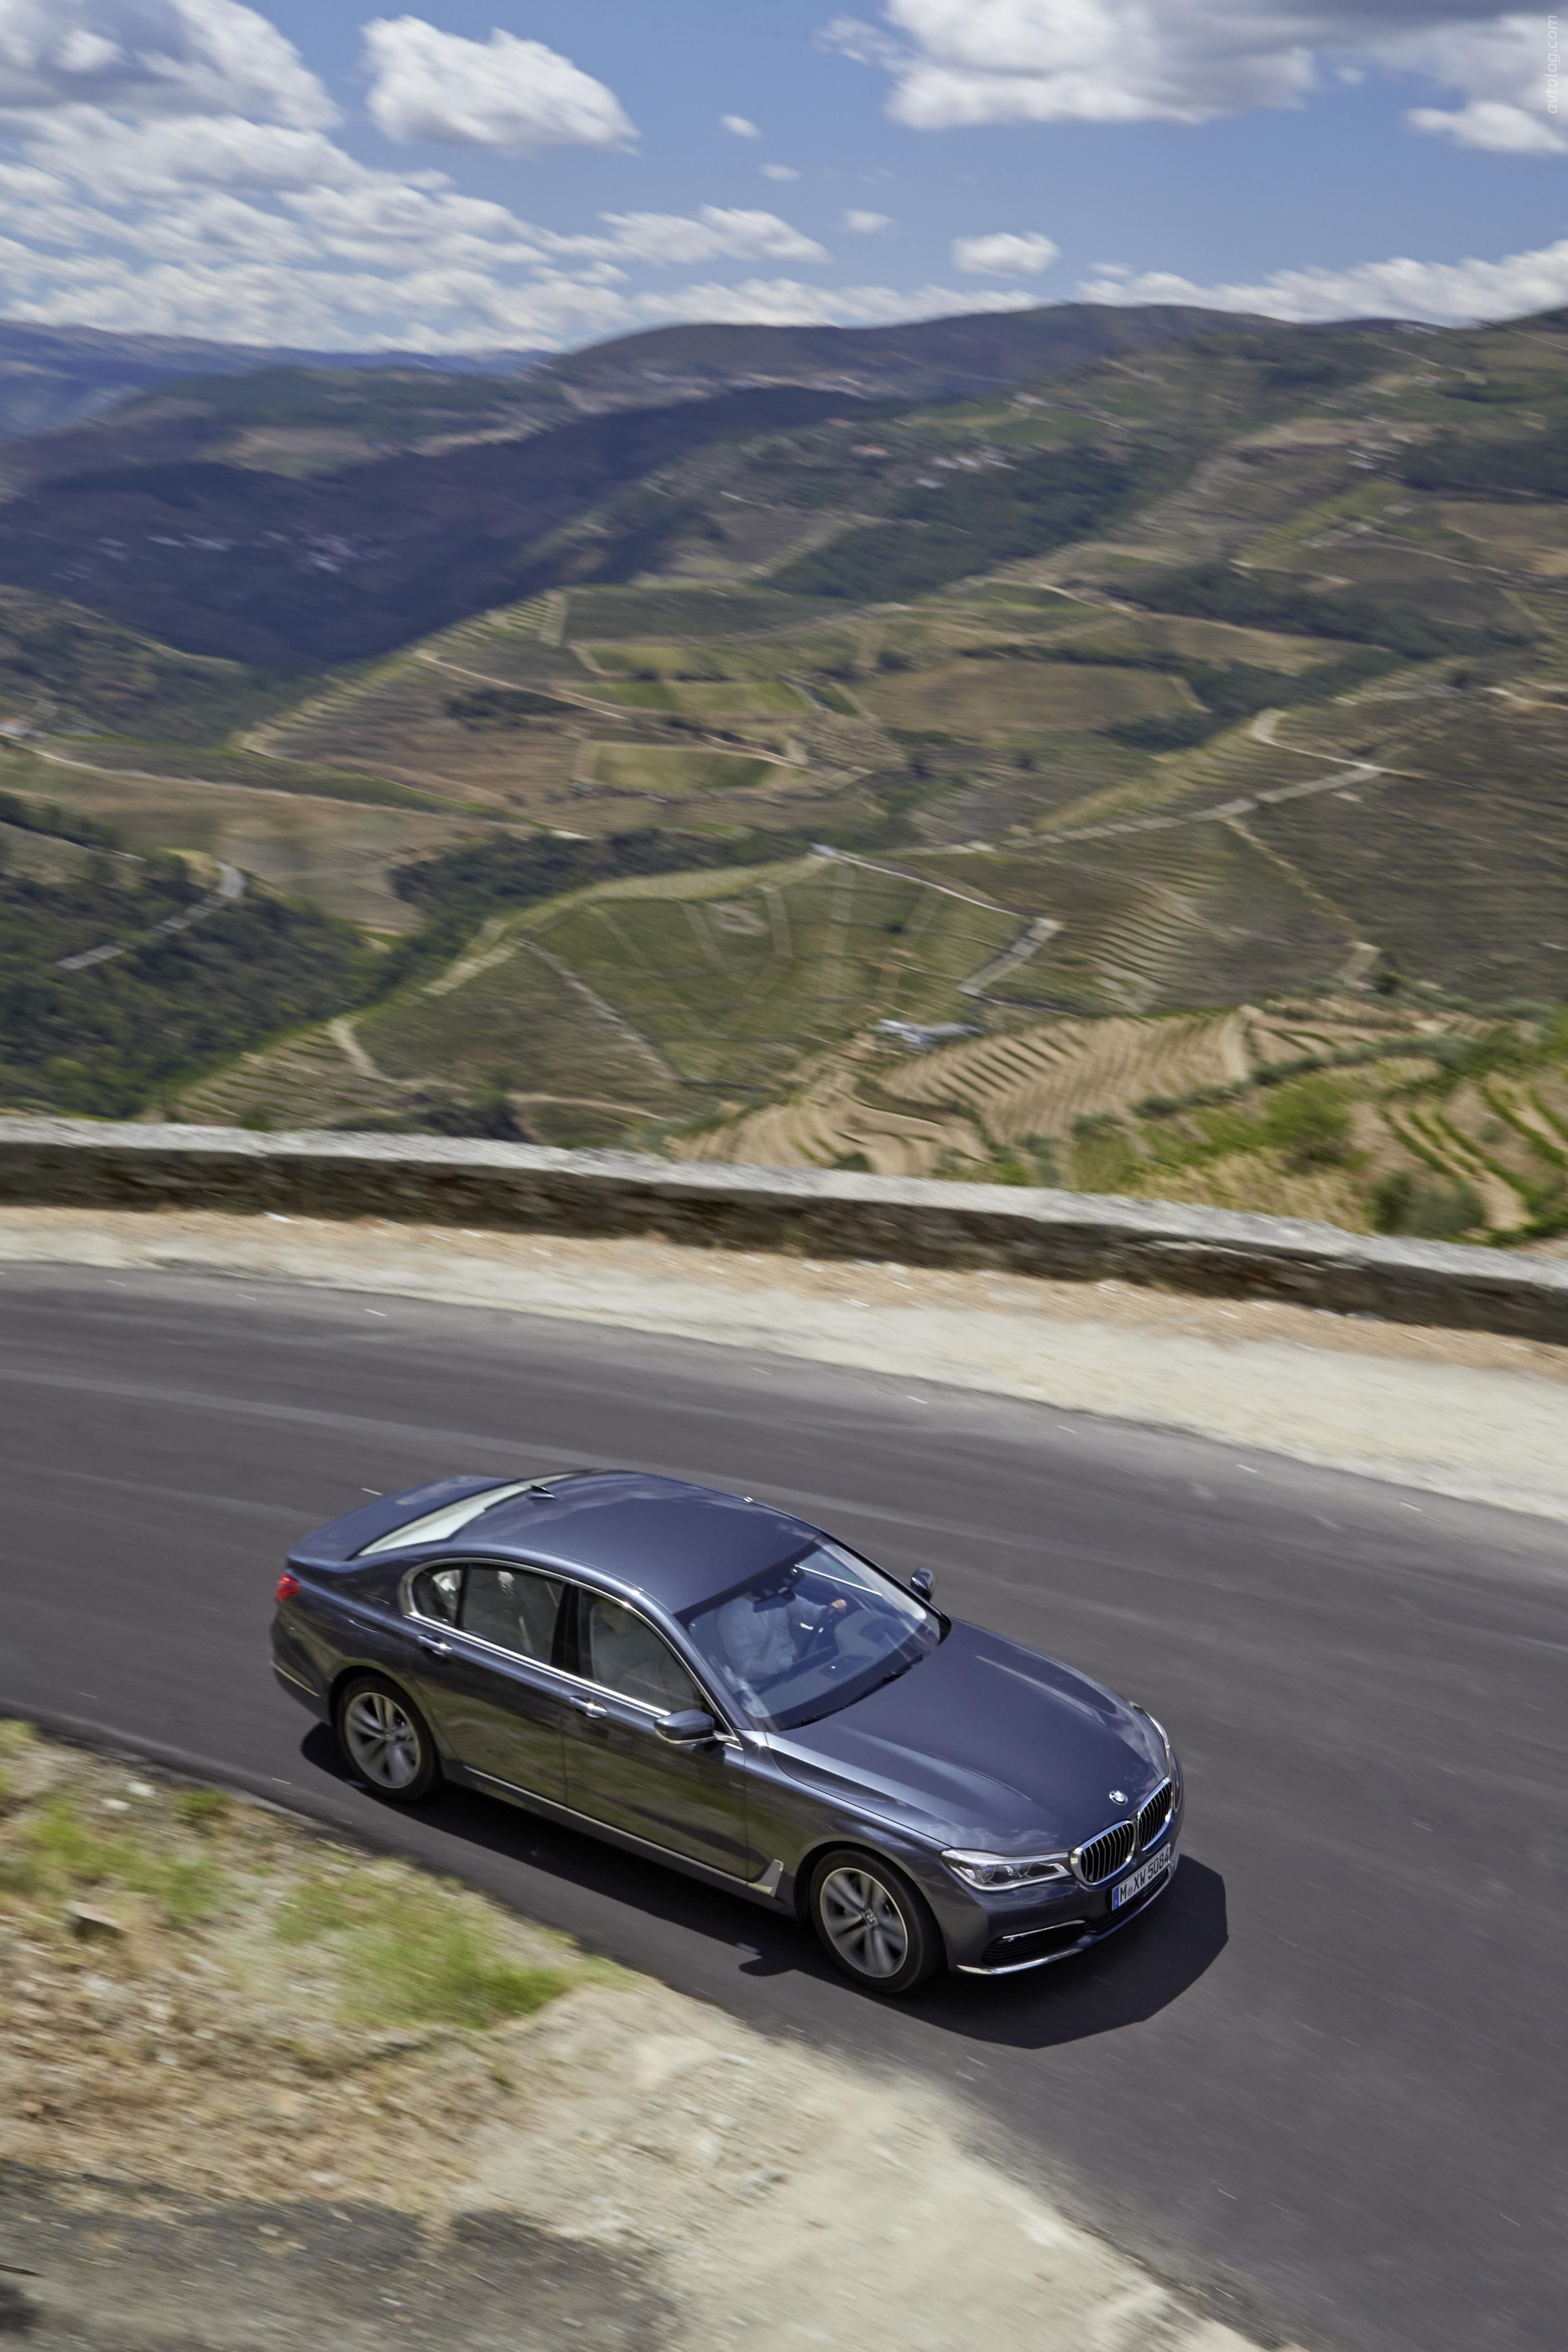 2016 BMW 730d BMW G11 BMW 7 Series Segment F BMW 730d